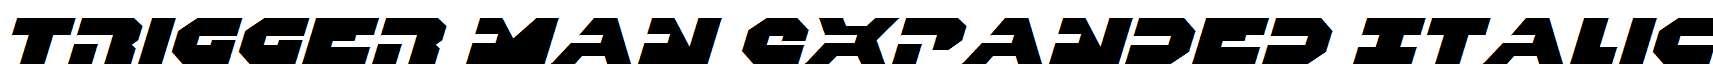 Trigger-Man-Expanded-Italic